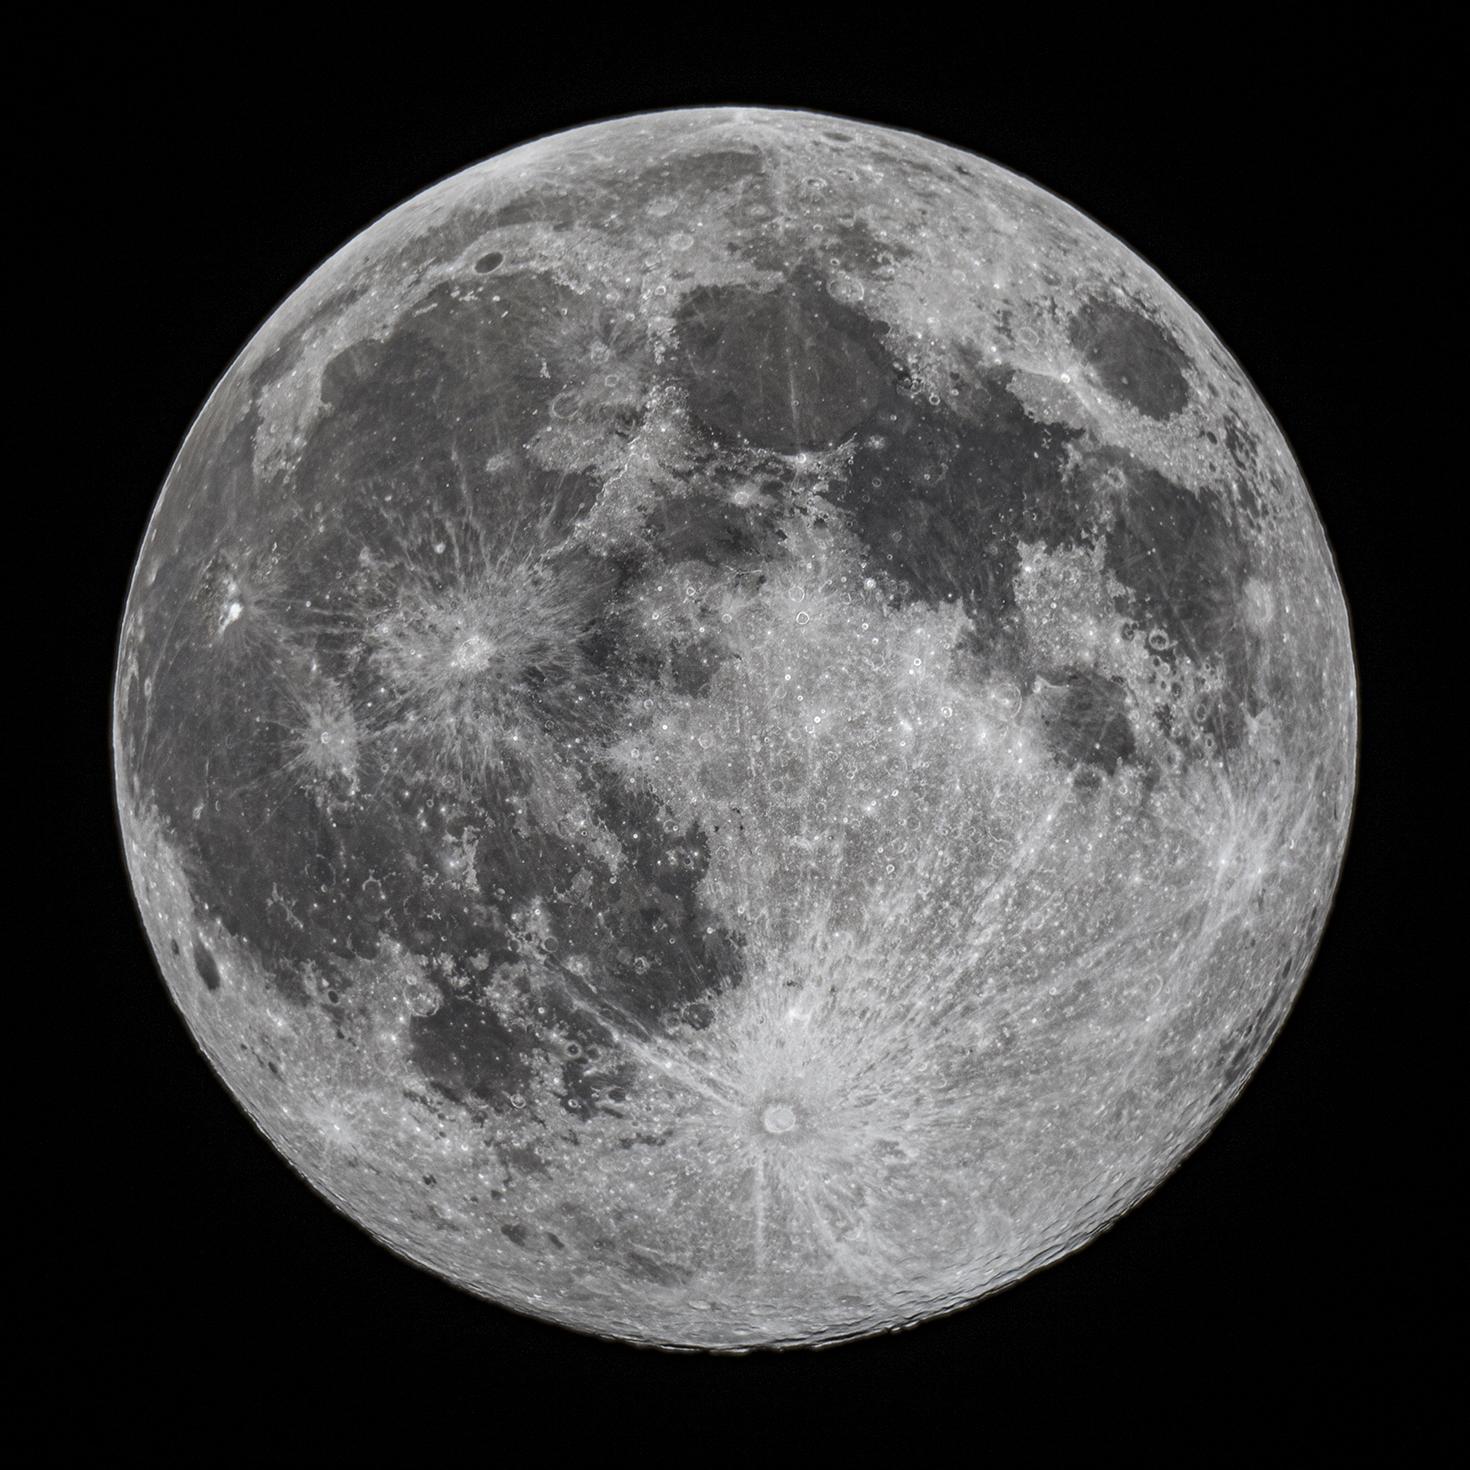 Superluna del 8 de abril de 2020 fotografiada a través de un telescopio Celestron C8